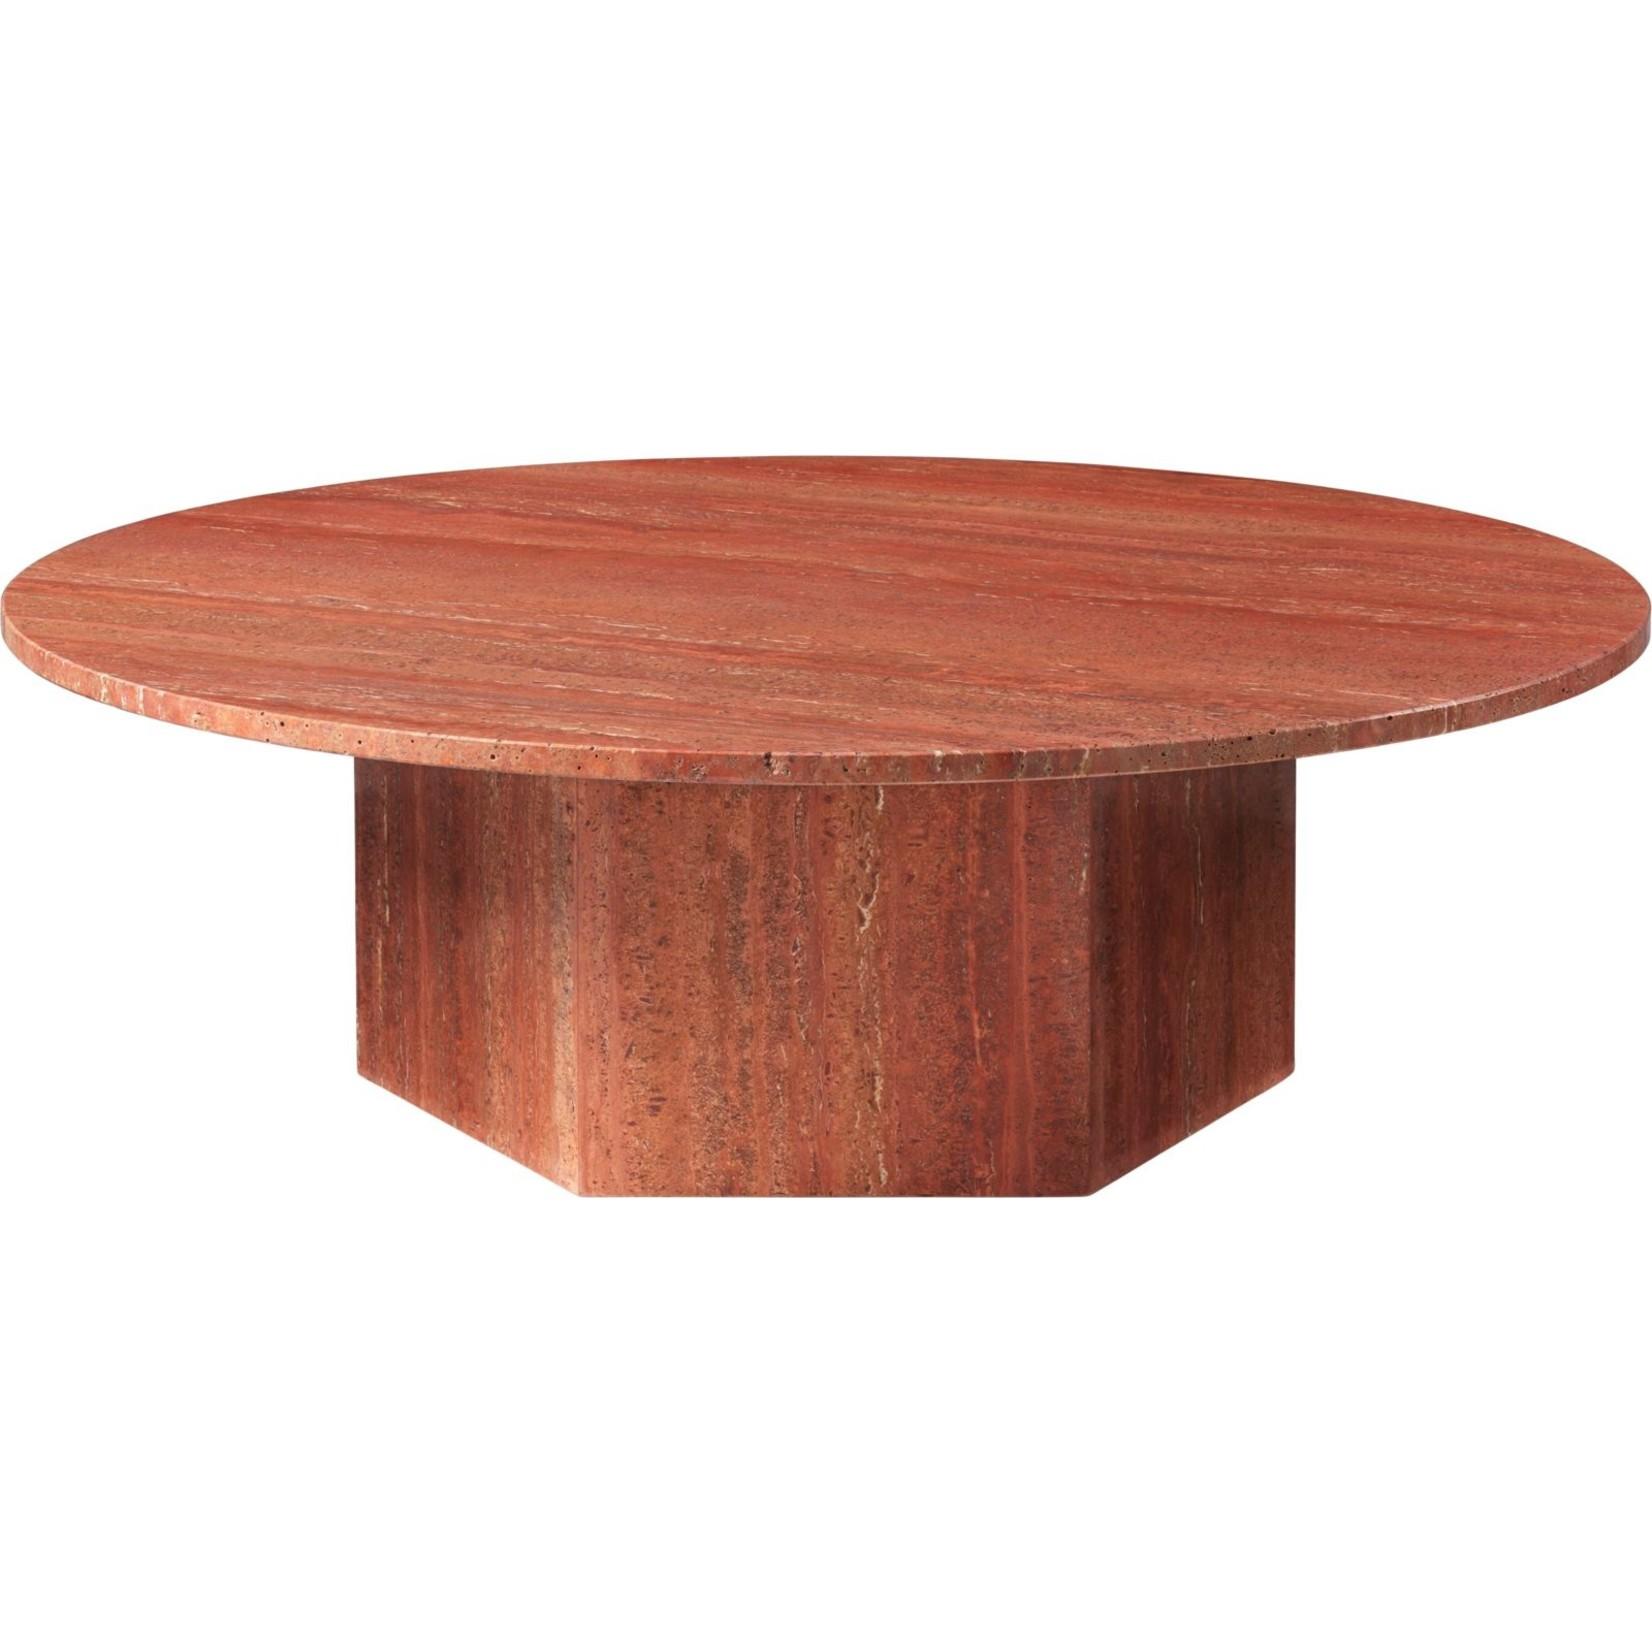 Epic Round Coffee Table Ø110 cm | Red Travertine